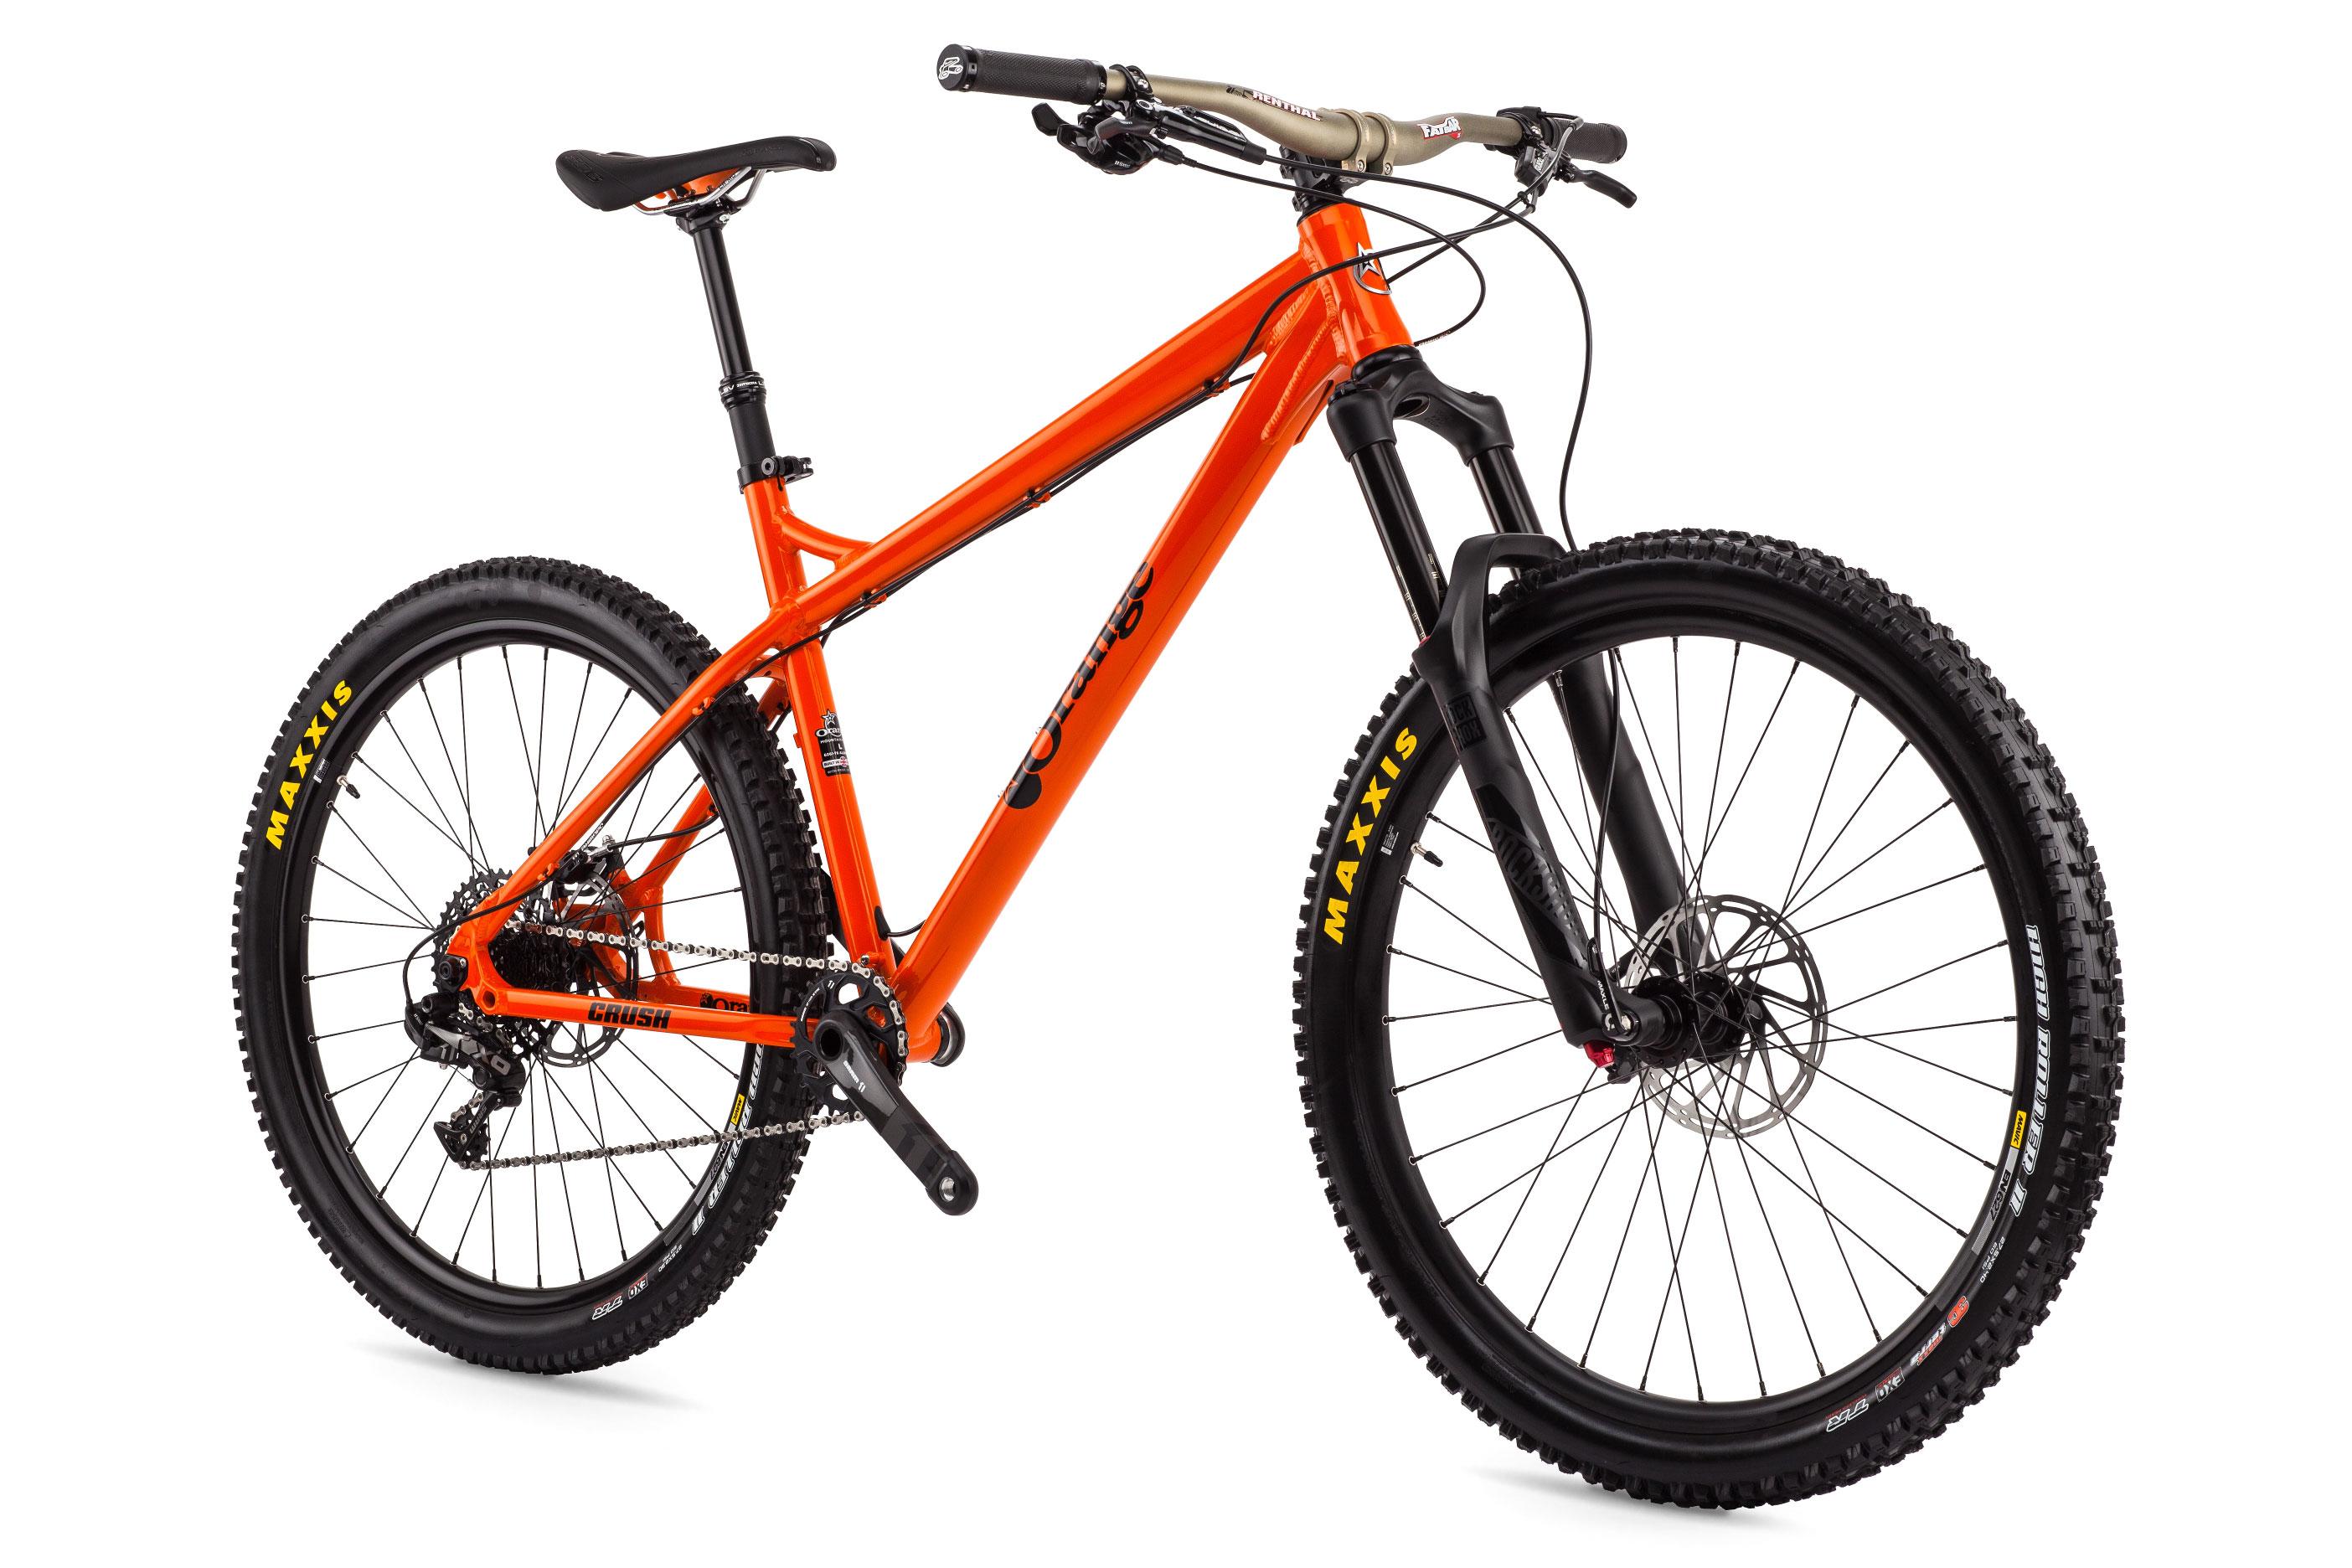 Sticker design for mountain bike - 2017 Crush Rs